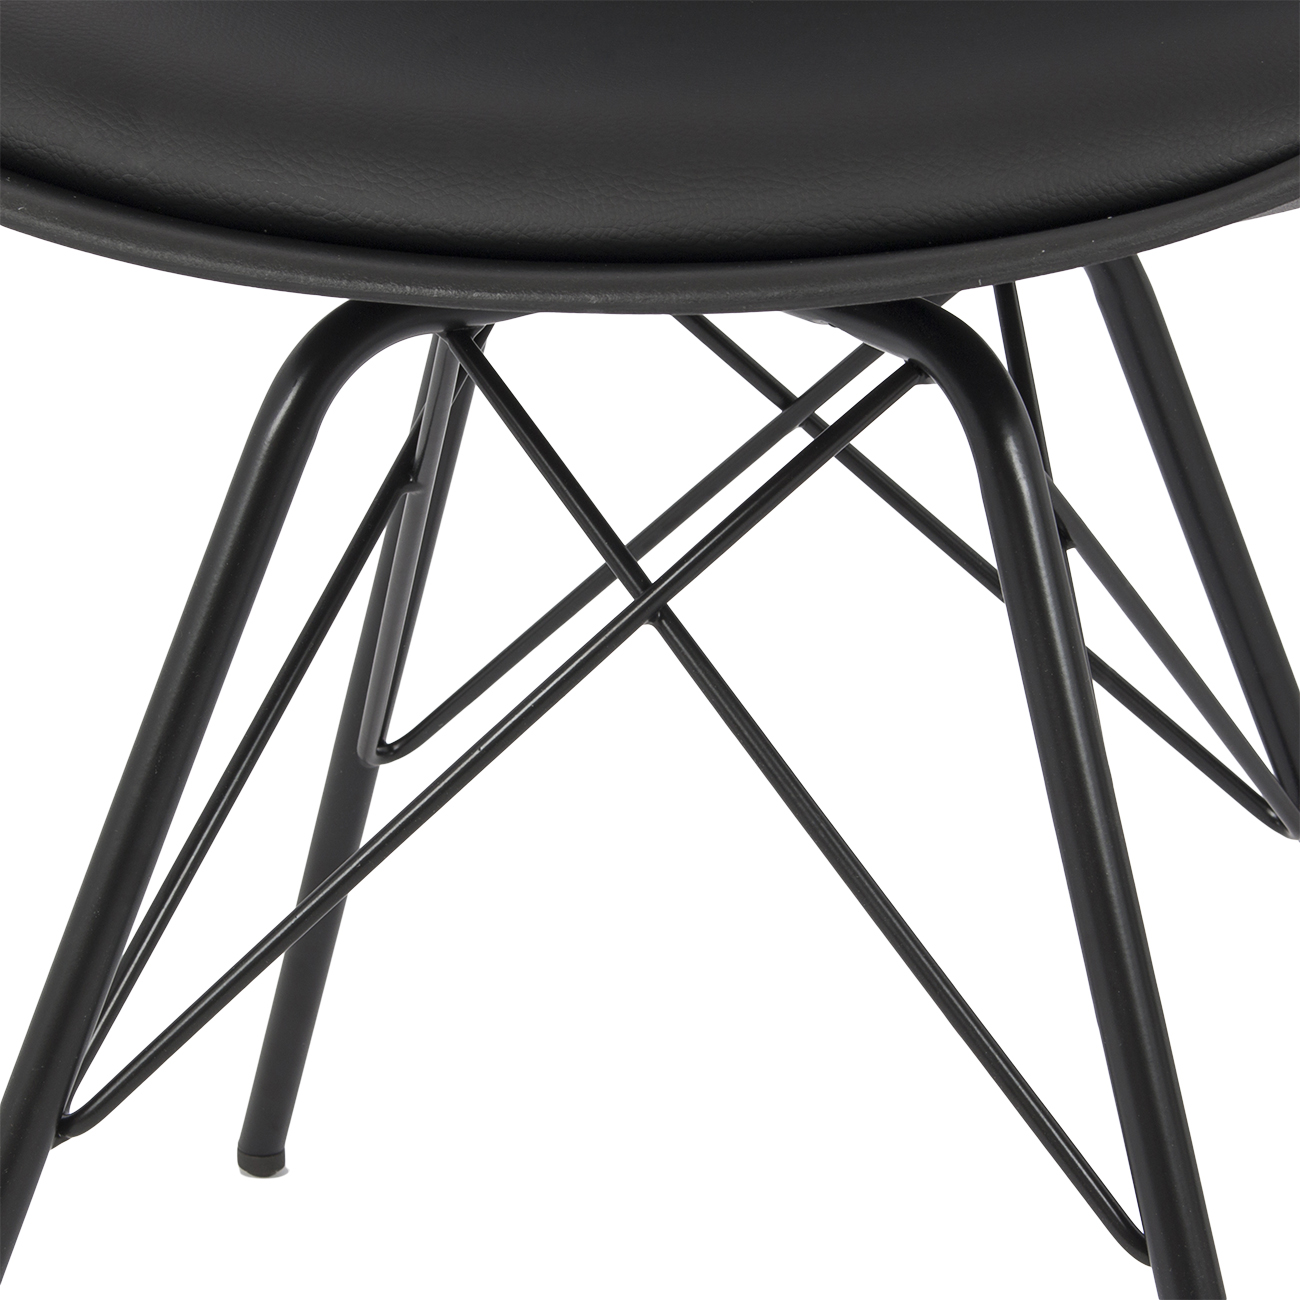 Premium Eiffel Dowel Leg DSW Style Dining Side Chair w  : 014 hg 14086 bk4 from www.ebay.com size 1300 x 1300 jpeg 556kB